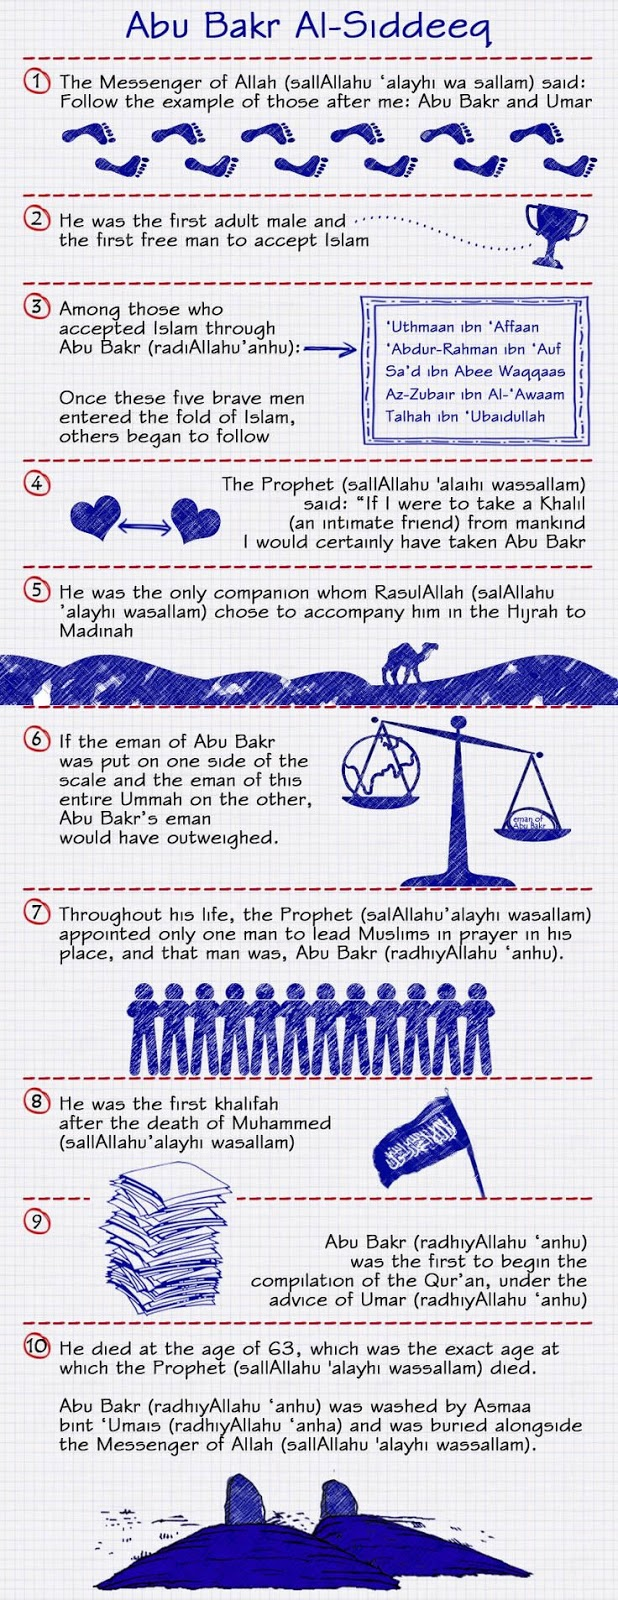 Abu Bakr infographic